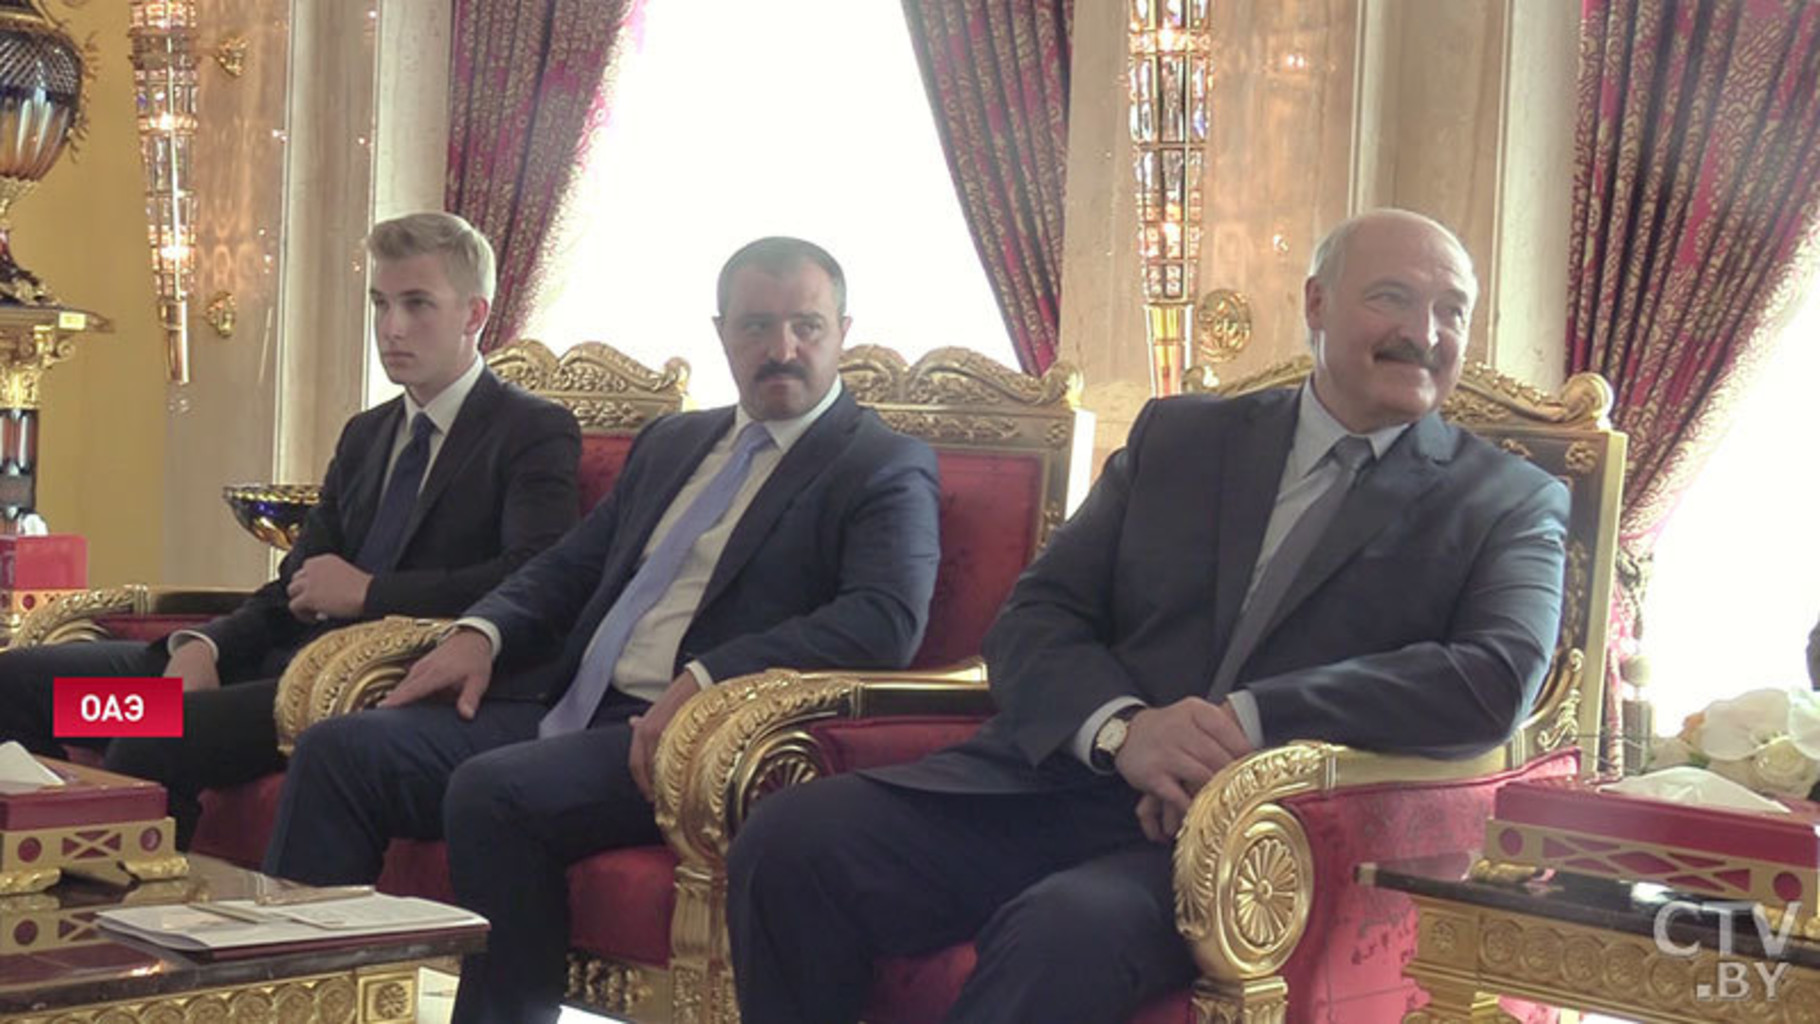 Lukashenko v oae05 1